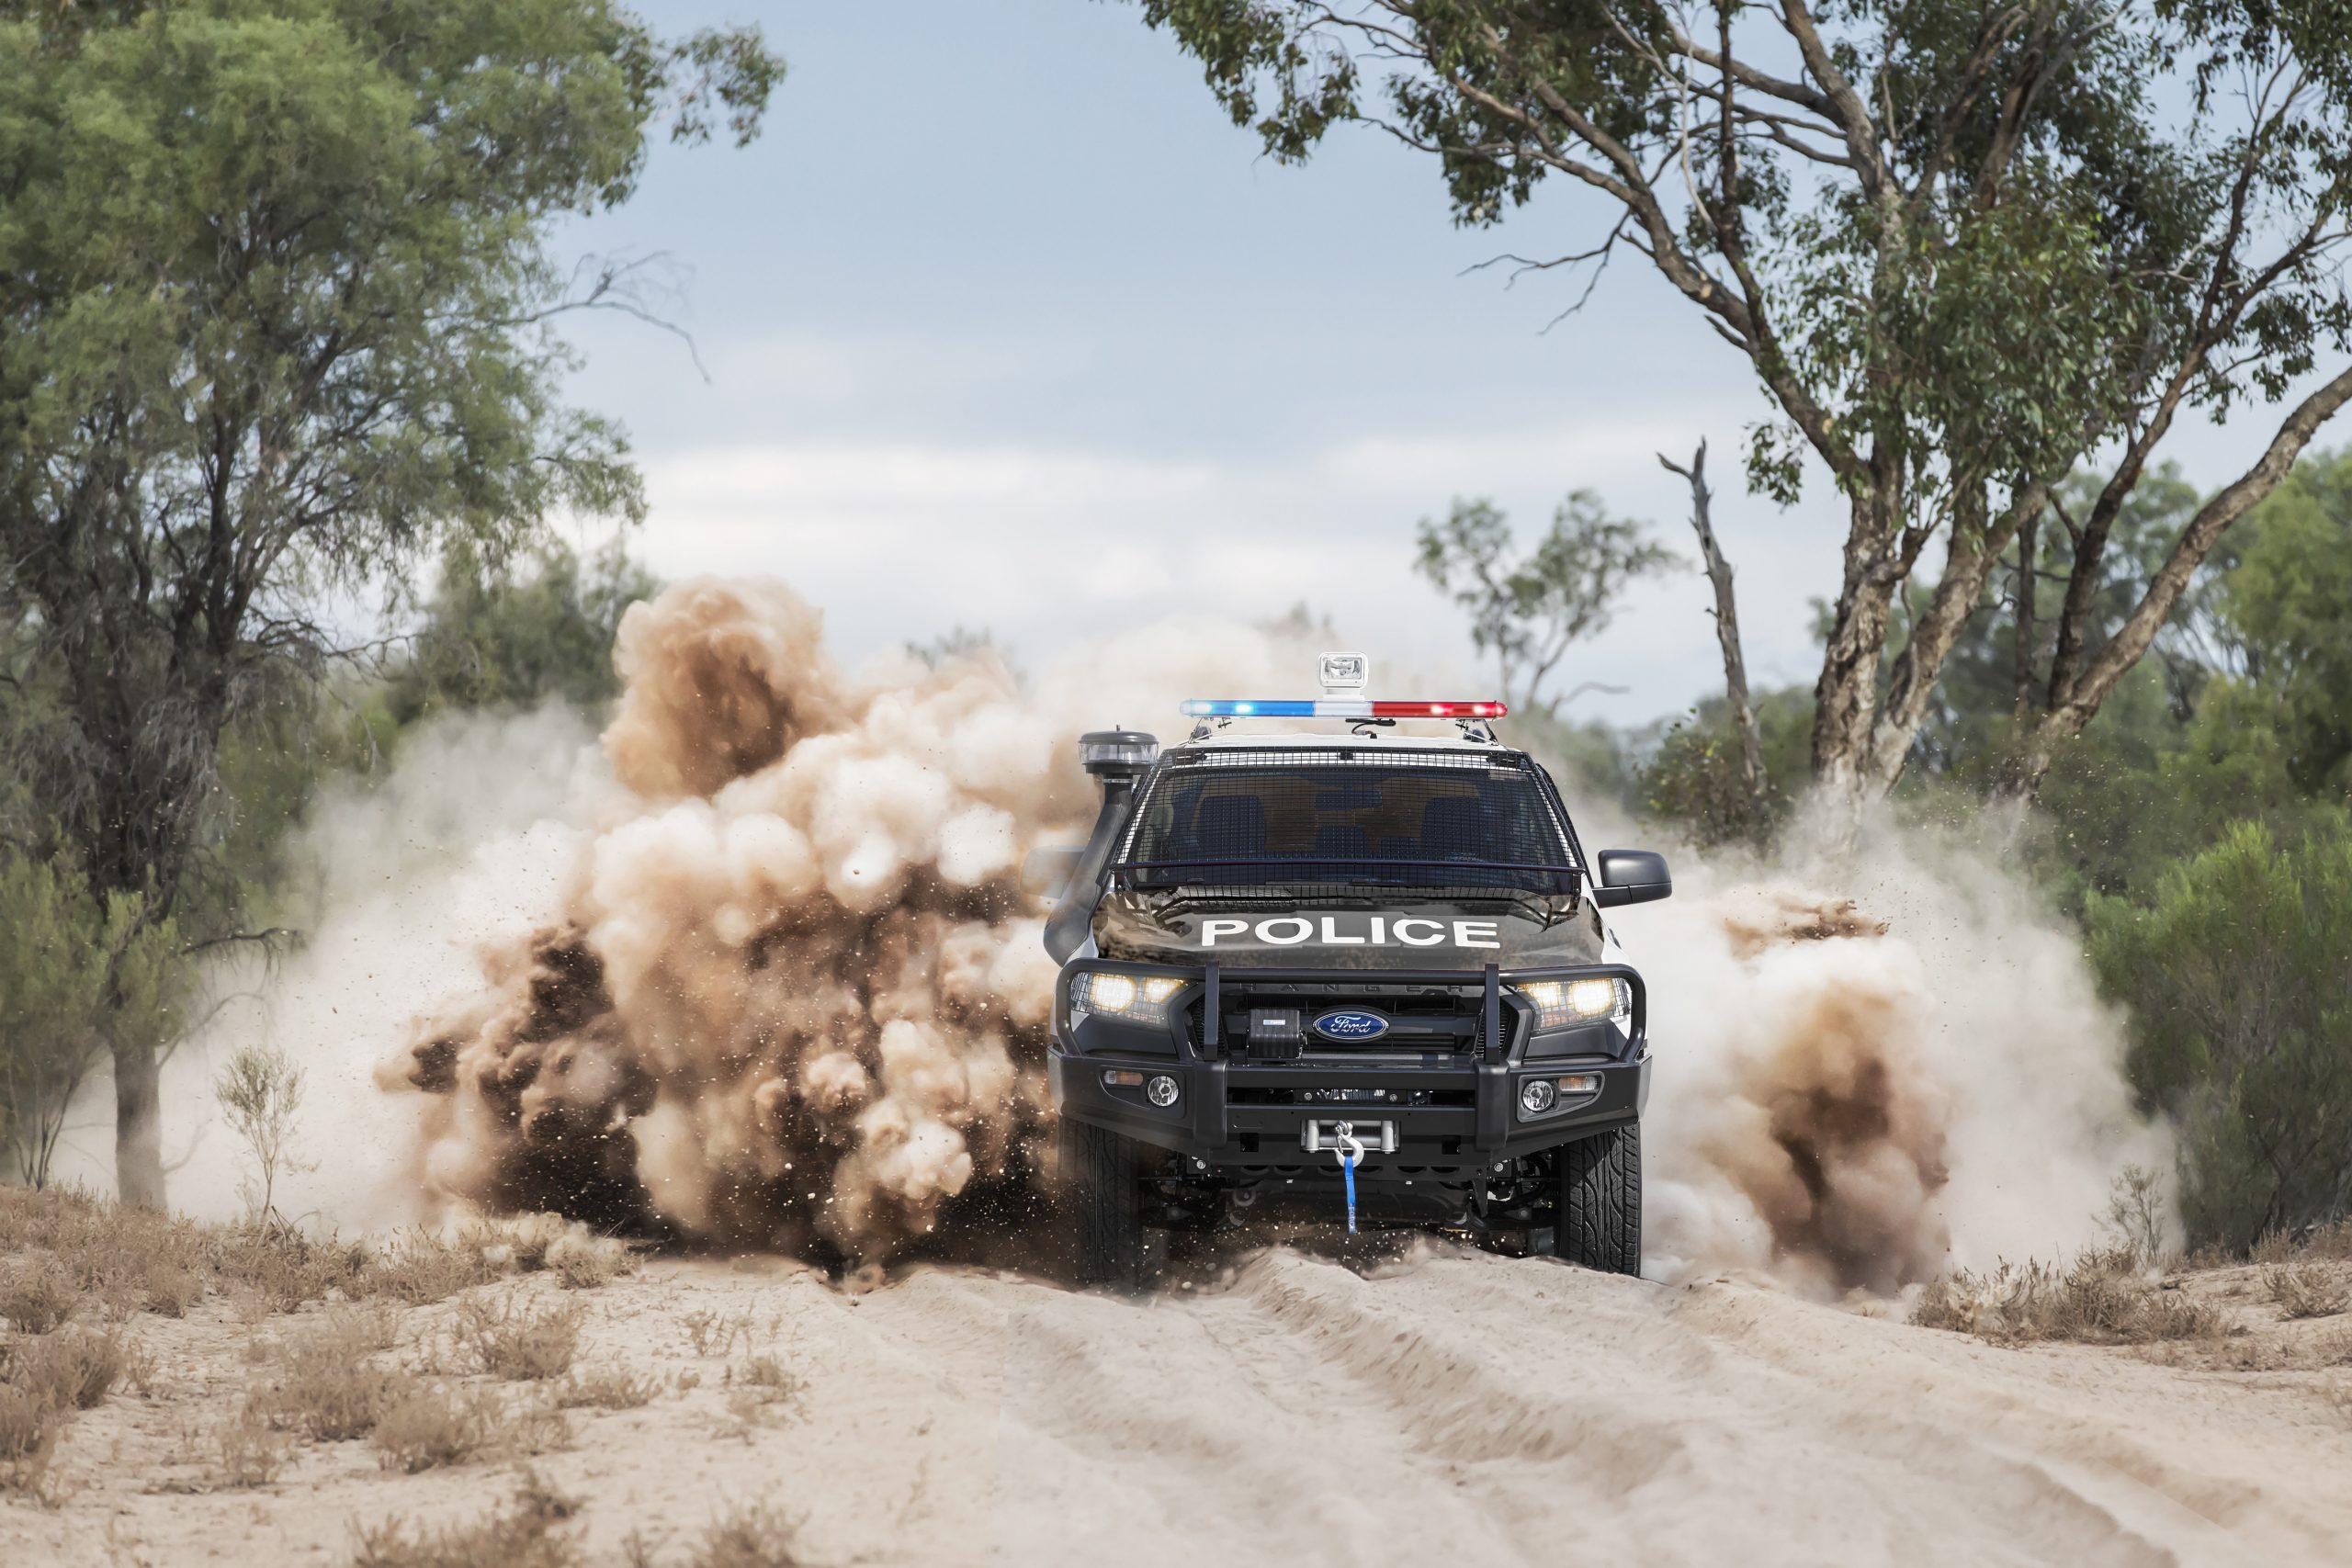 POLICE 1 TON PICK UP